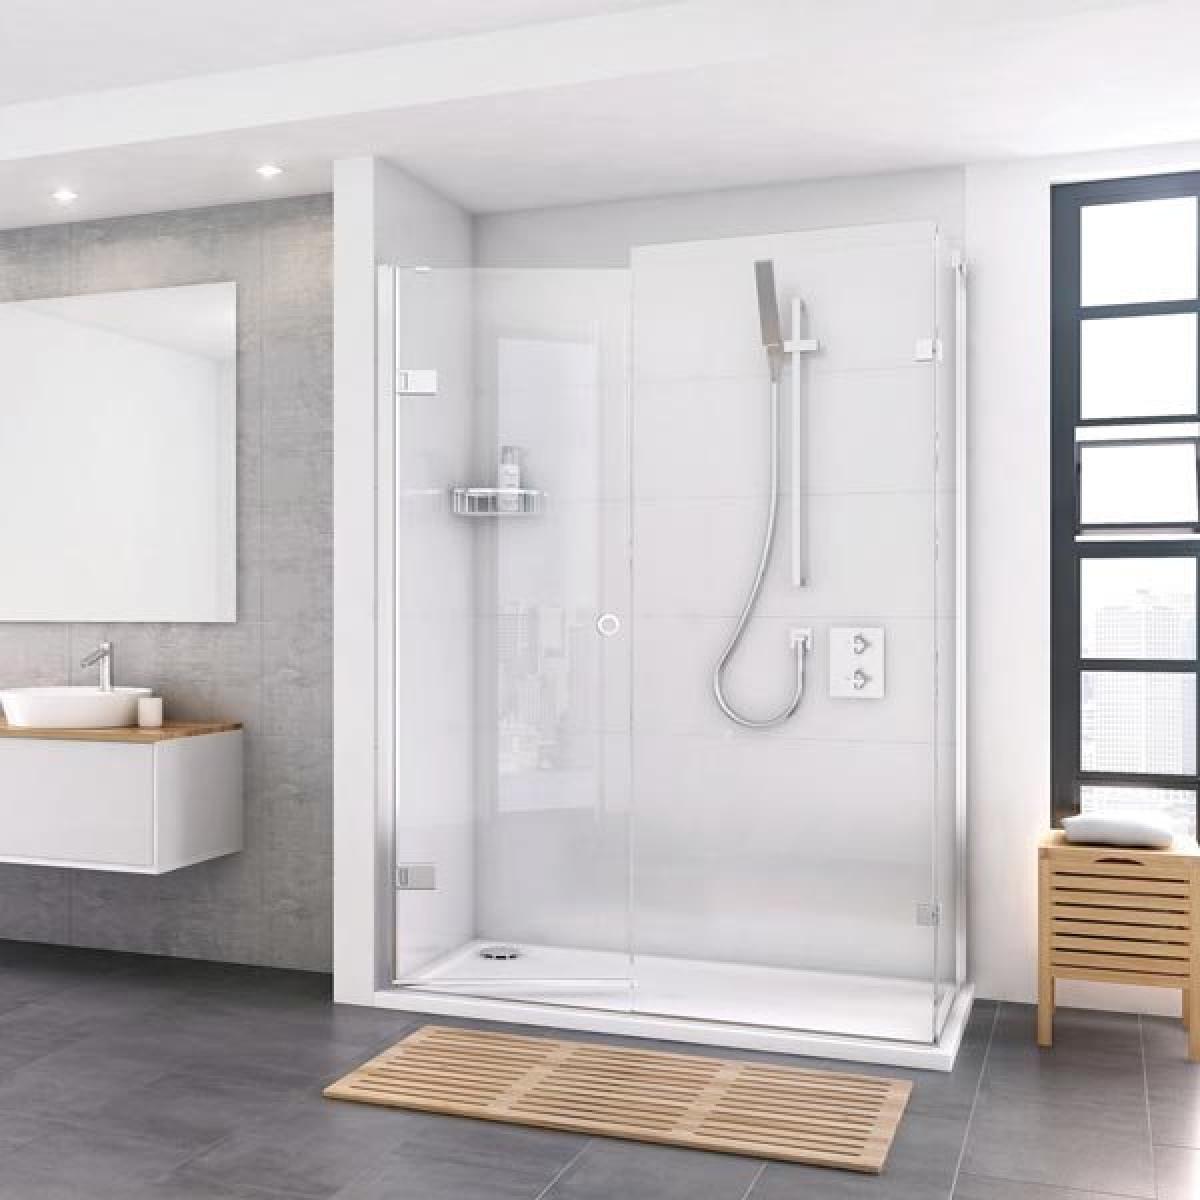 Roman Decem Inward Opening Hinged Shower Door Inline Side Panel 1600x900mm Dxl1hdr2fb